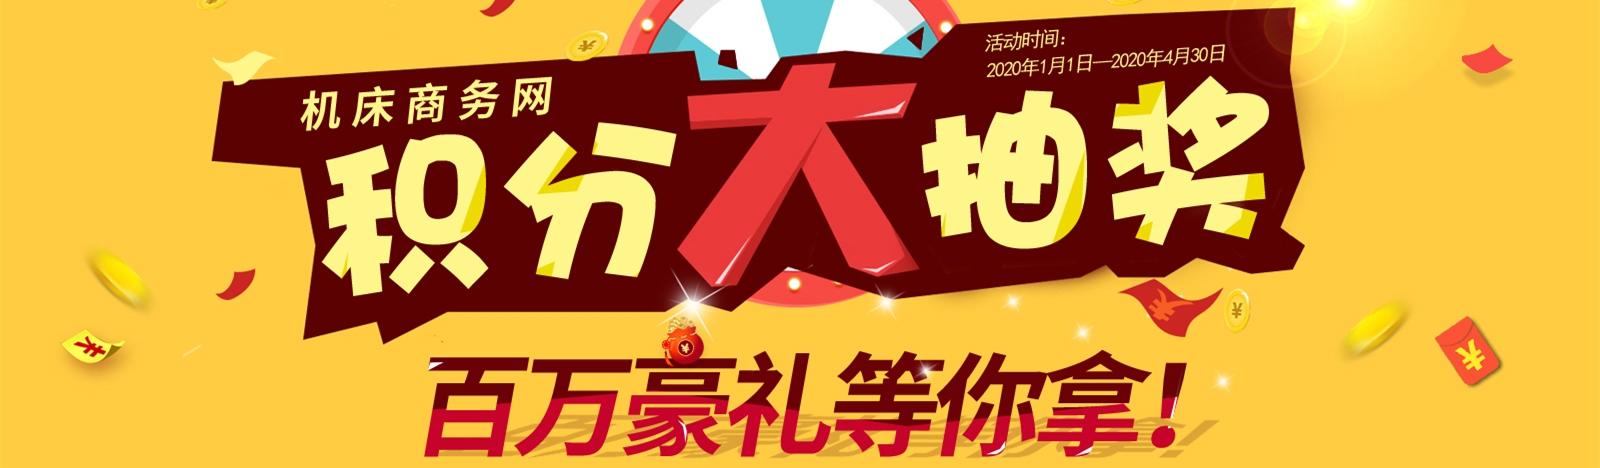 best365亚洲版官网商务网喊你积分抽奖啦!